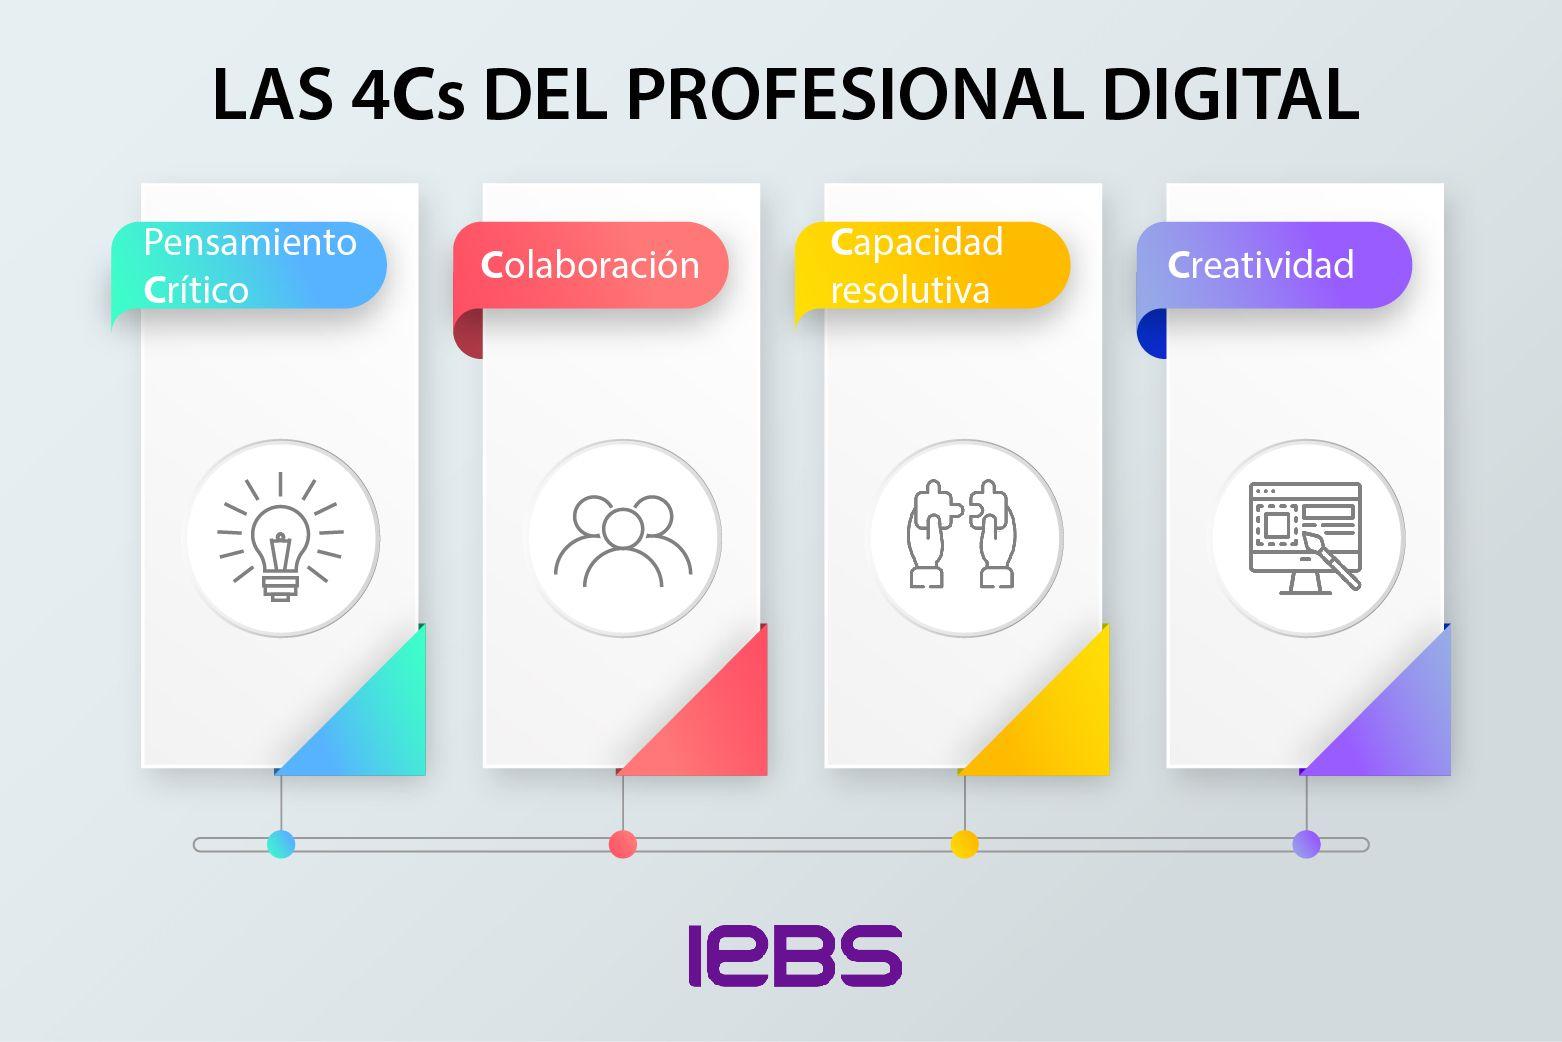 Las 4Cs del profesional digital